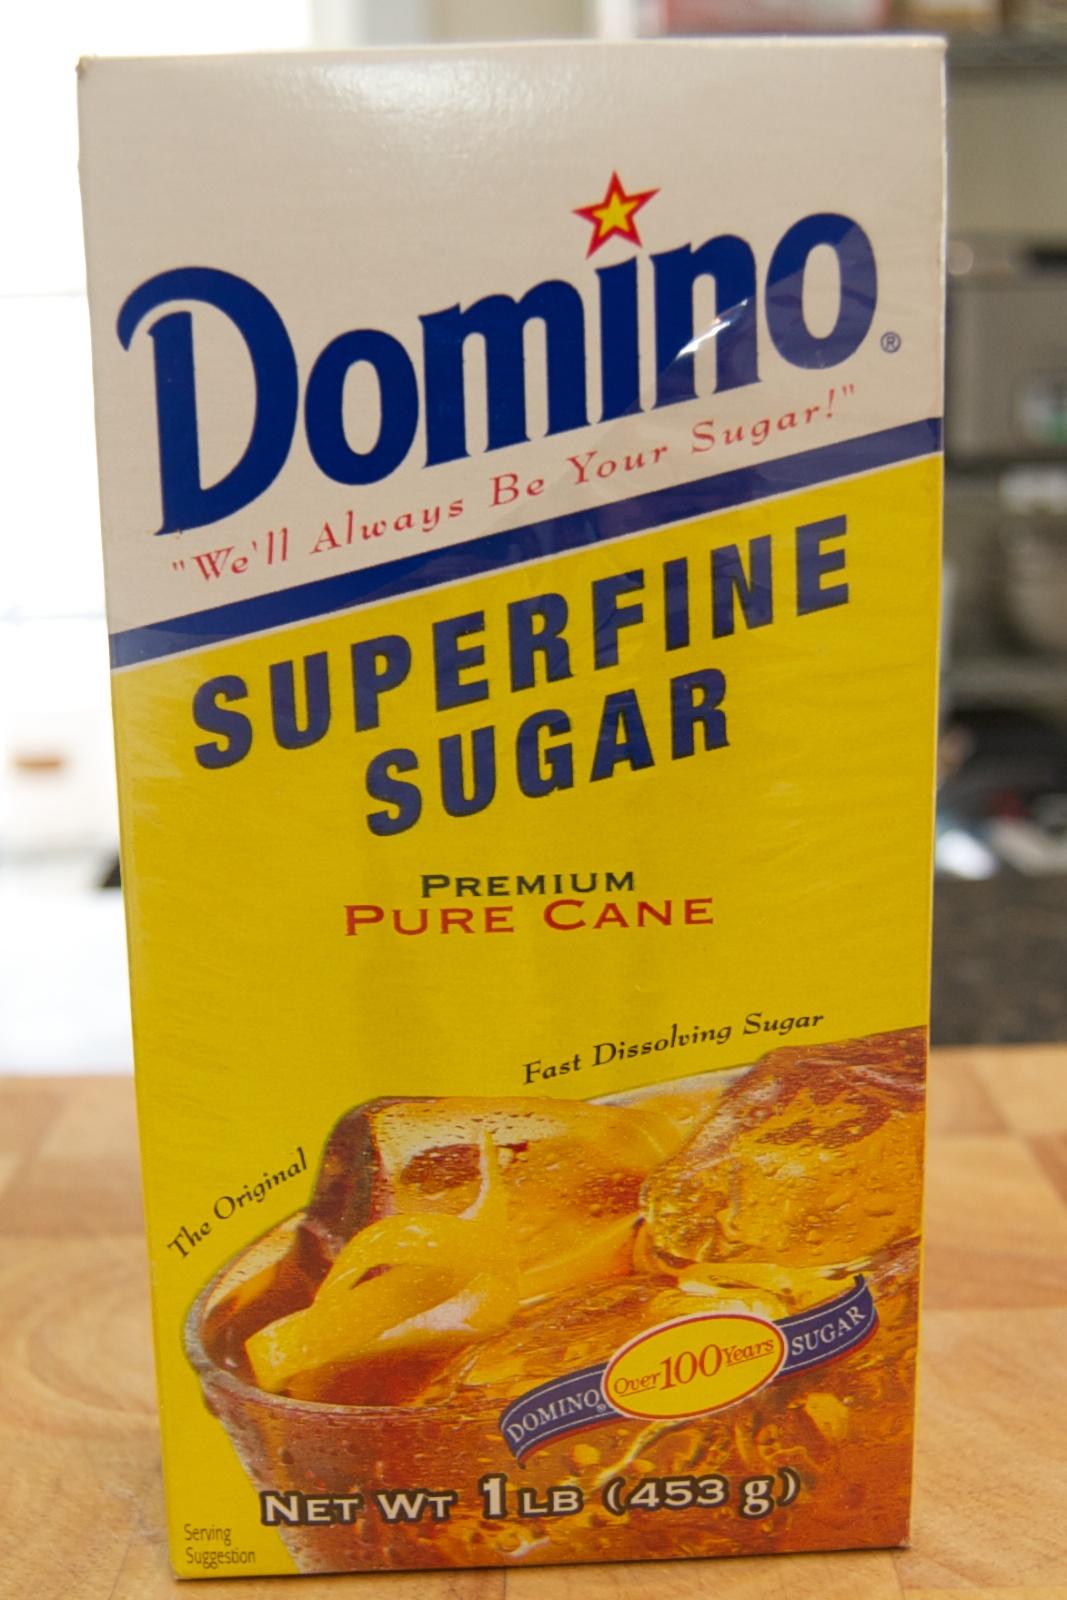 http://blog.rickk.com/food/2011/03/22/simplesyrup2.jpg